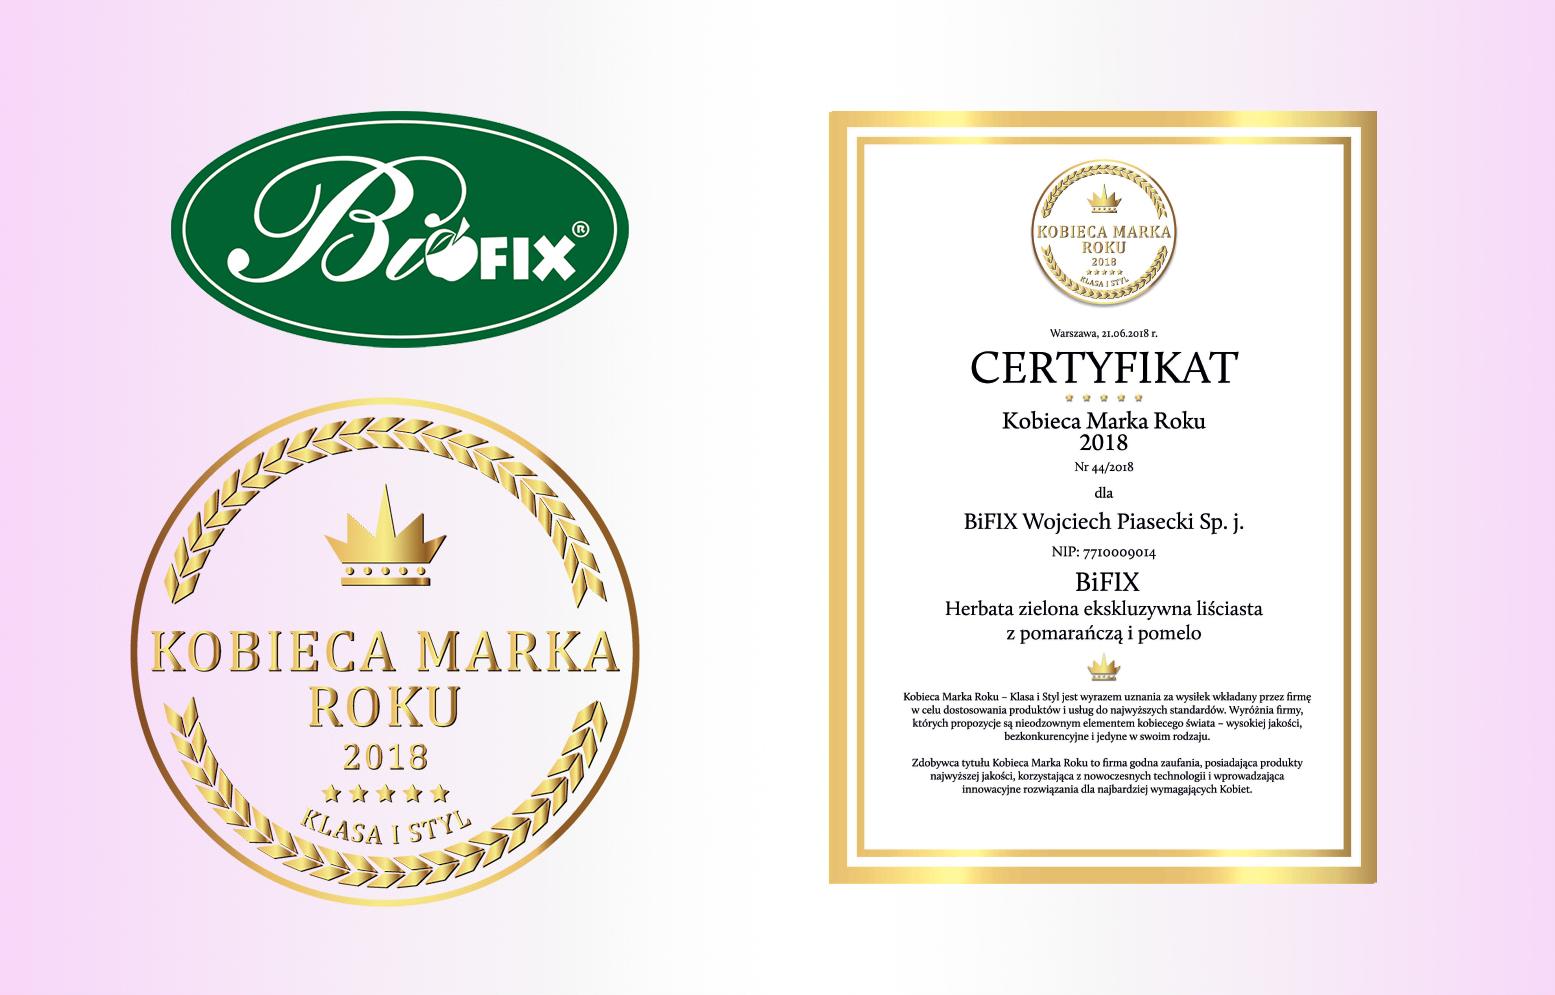 bifix_logo_certyfikatjpg